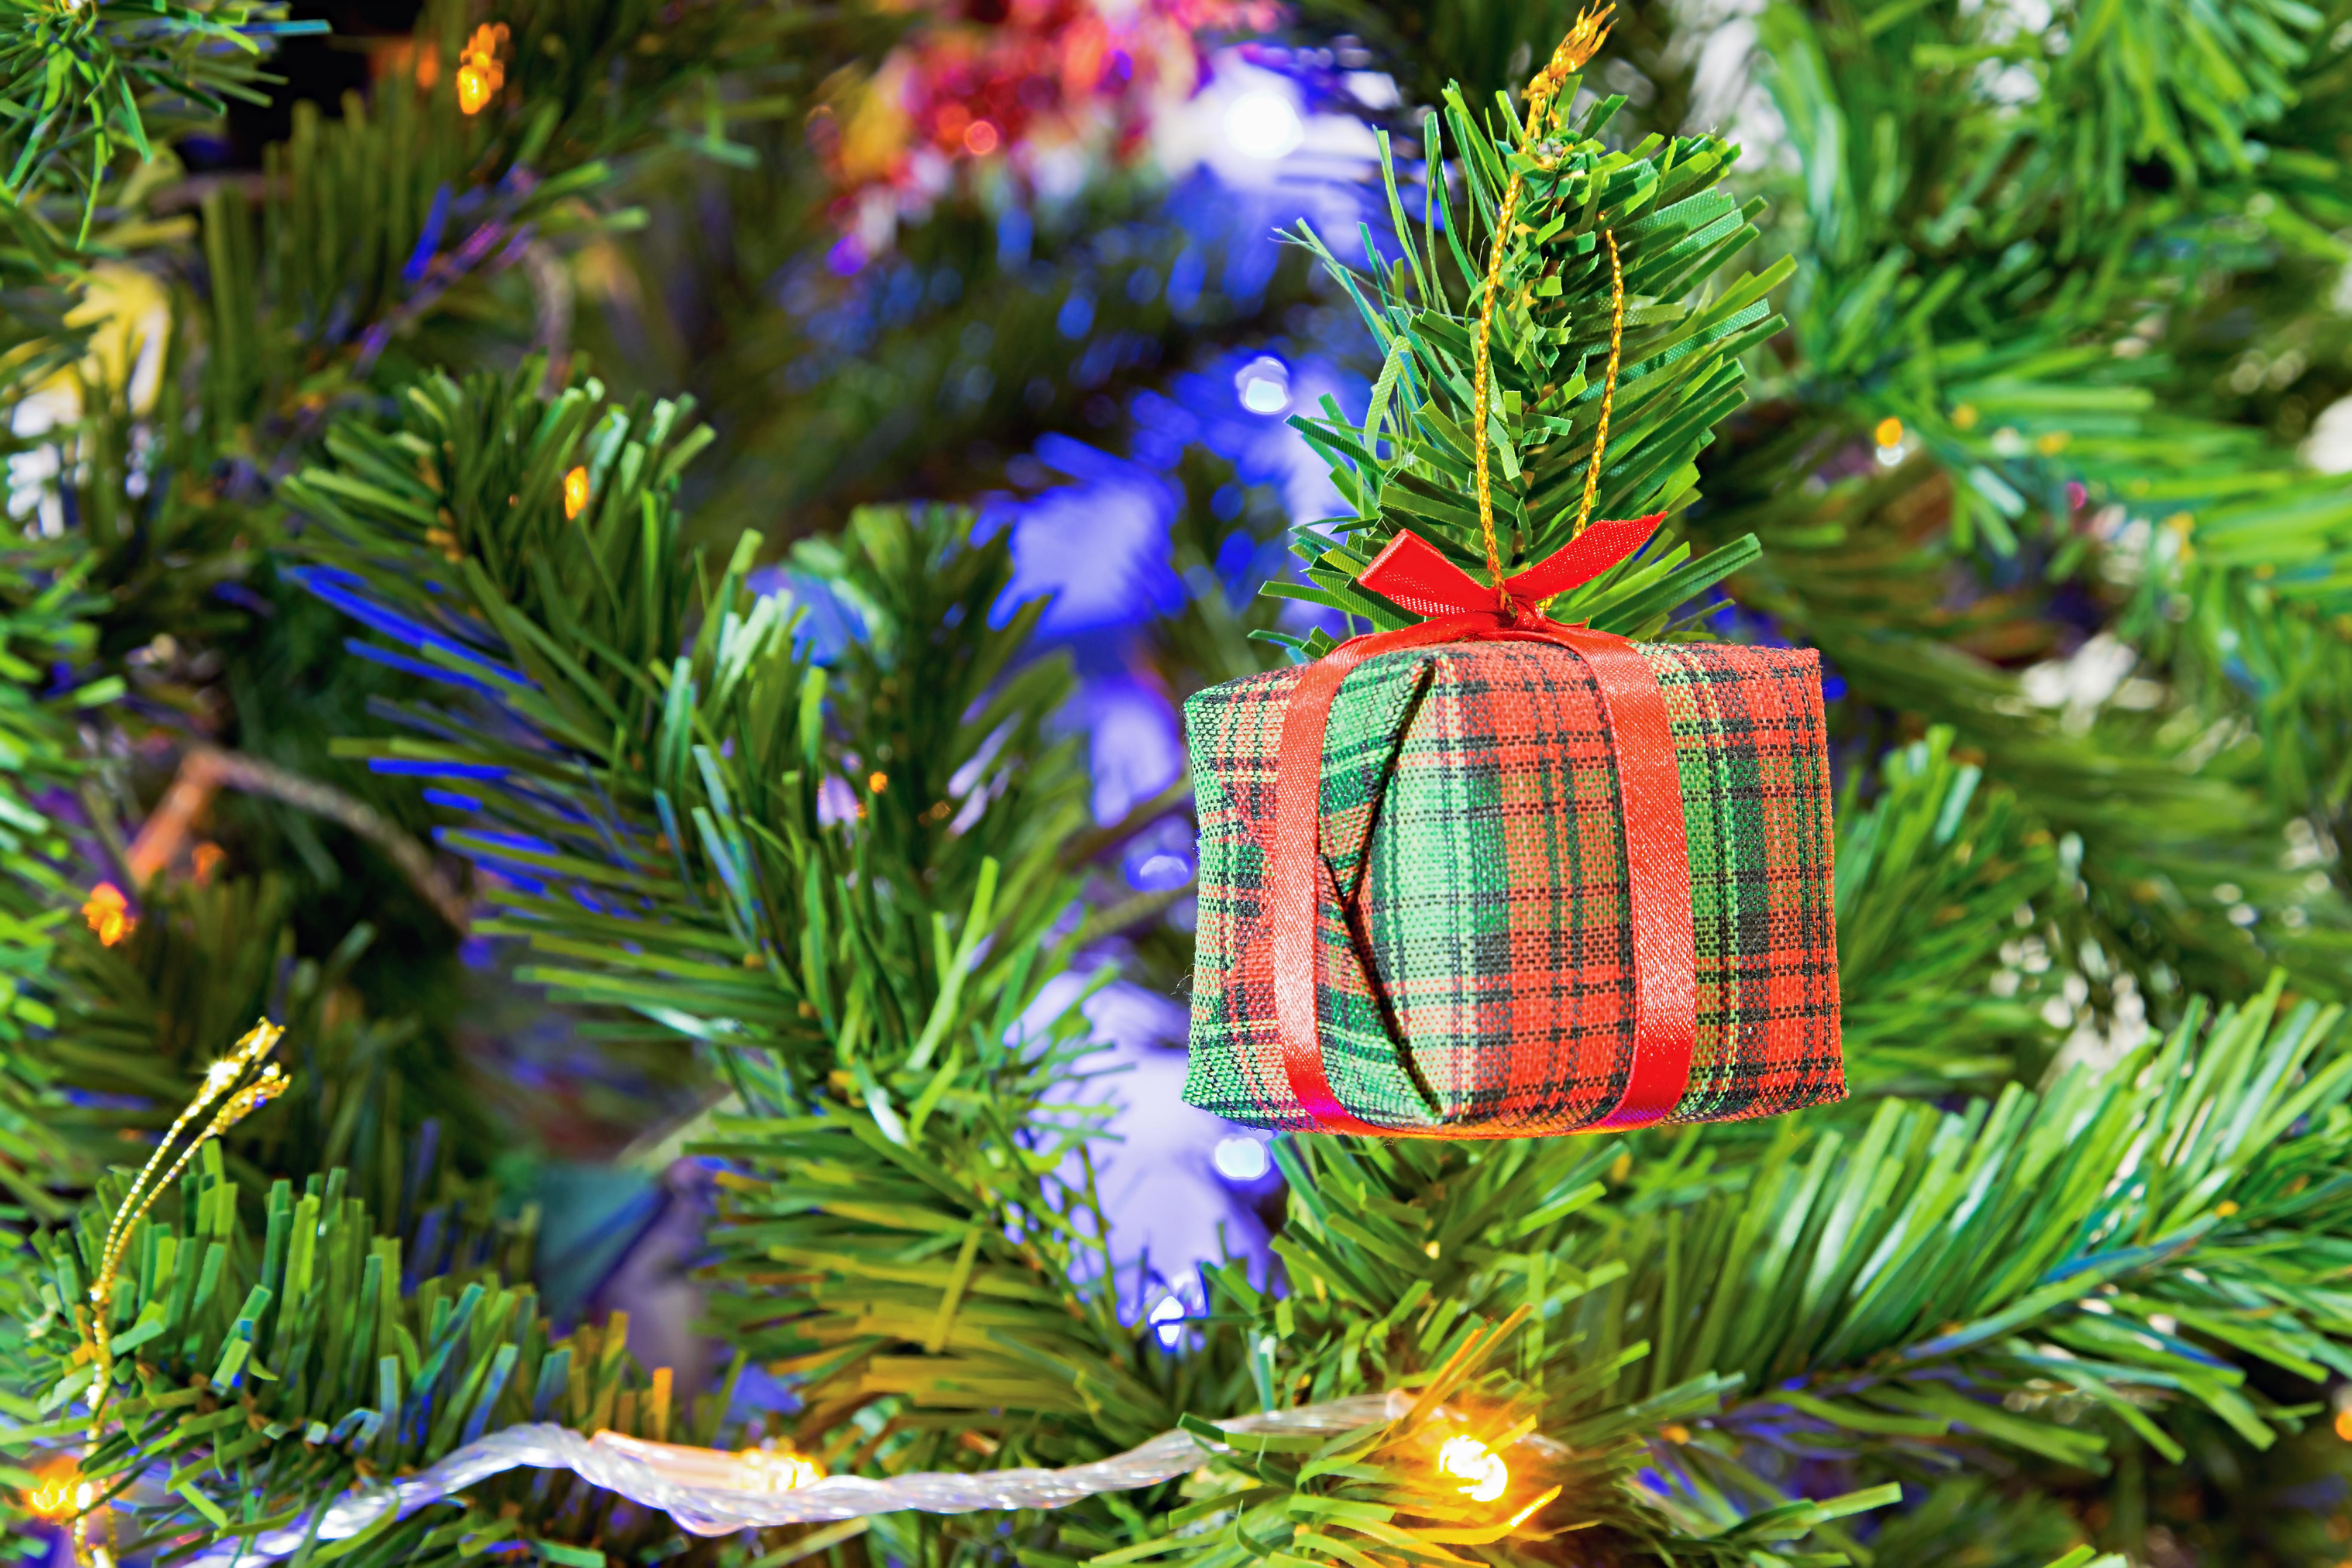 Free Images : branch, flower, gift, green, holiday, garden, fir ...